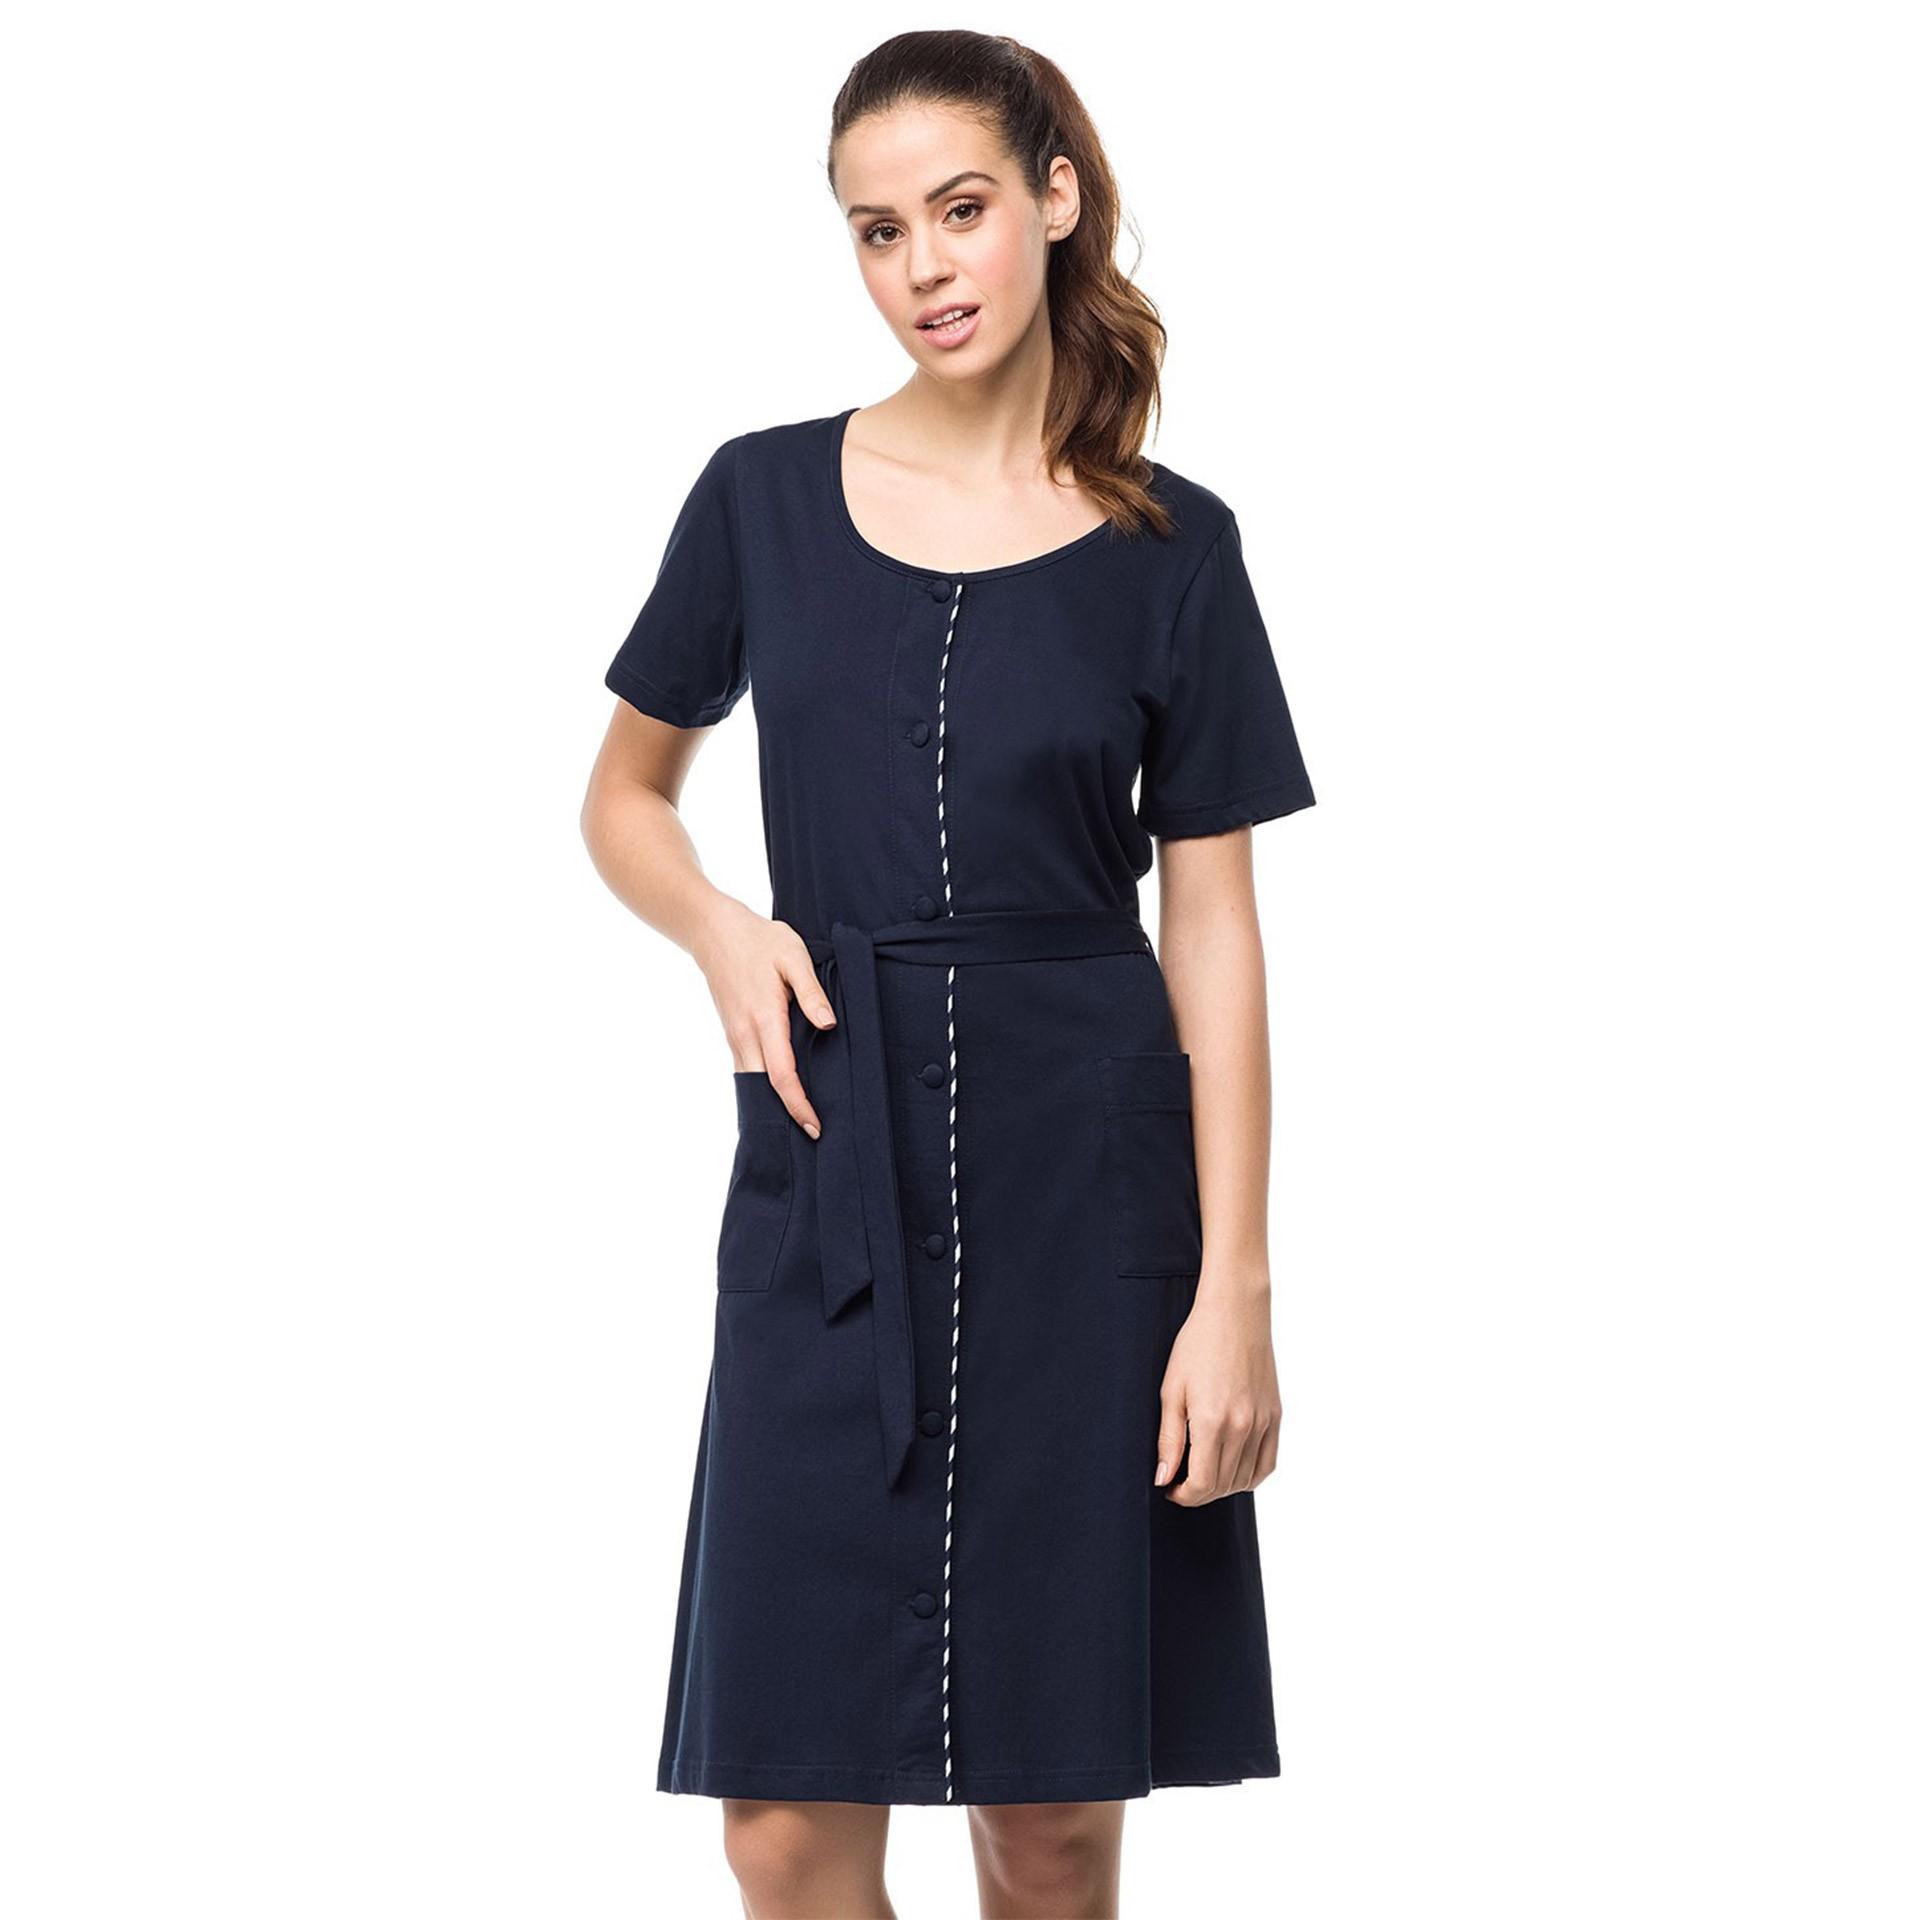 ffb8144d9cc6 Vamp μπλε κλασσικό φόρεμα θαλάσσης με κουμπιά (μεγάλα μεγέθη) 0411